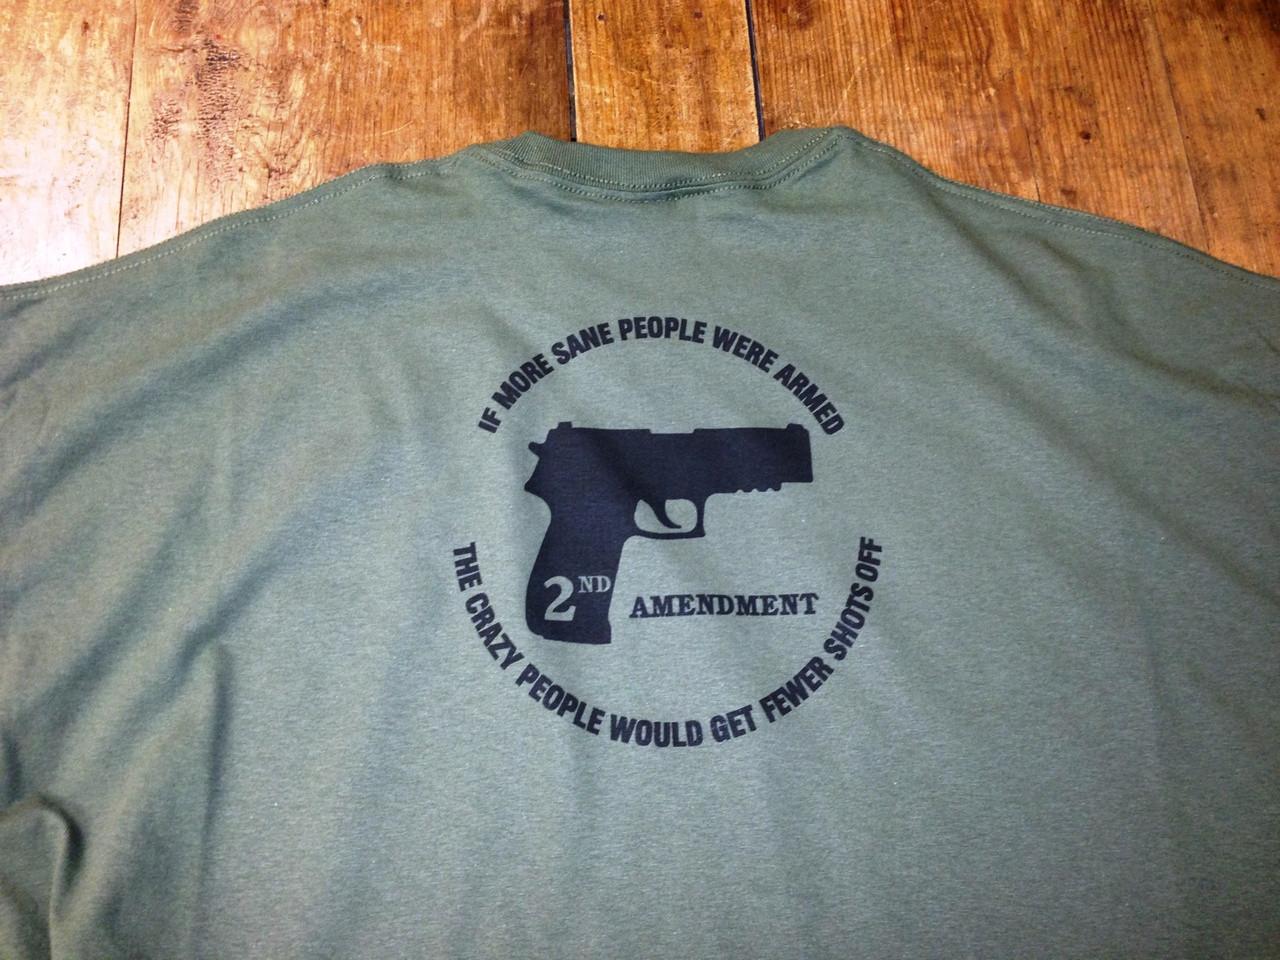 d3730cbb1 2Nd Amendment T-Shirt and motorcycle shirts